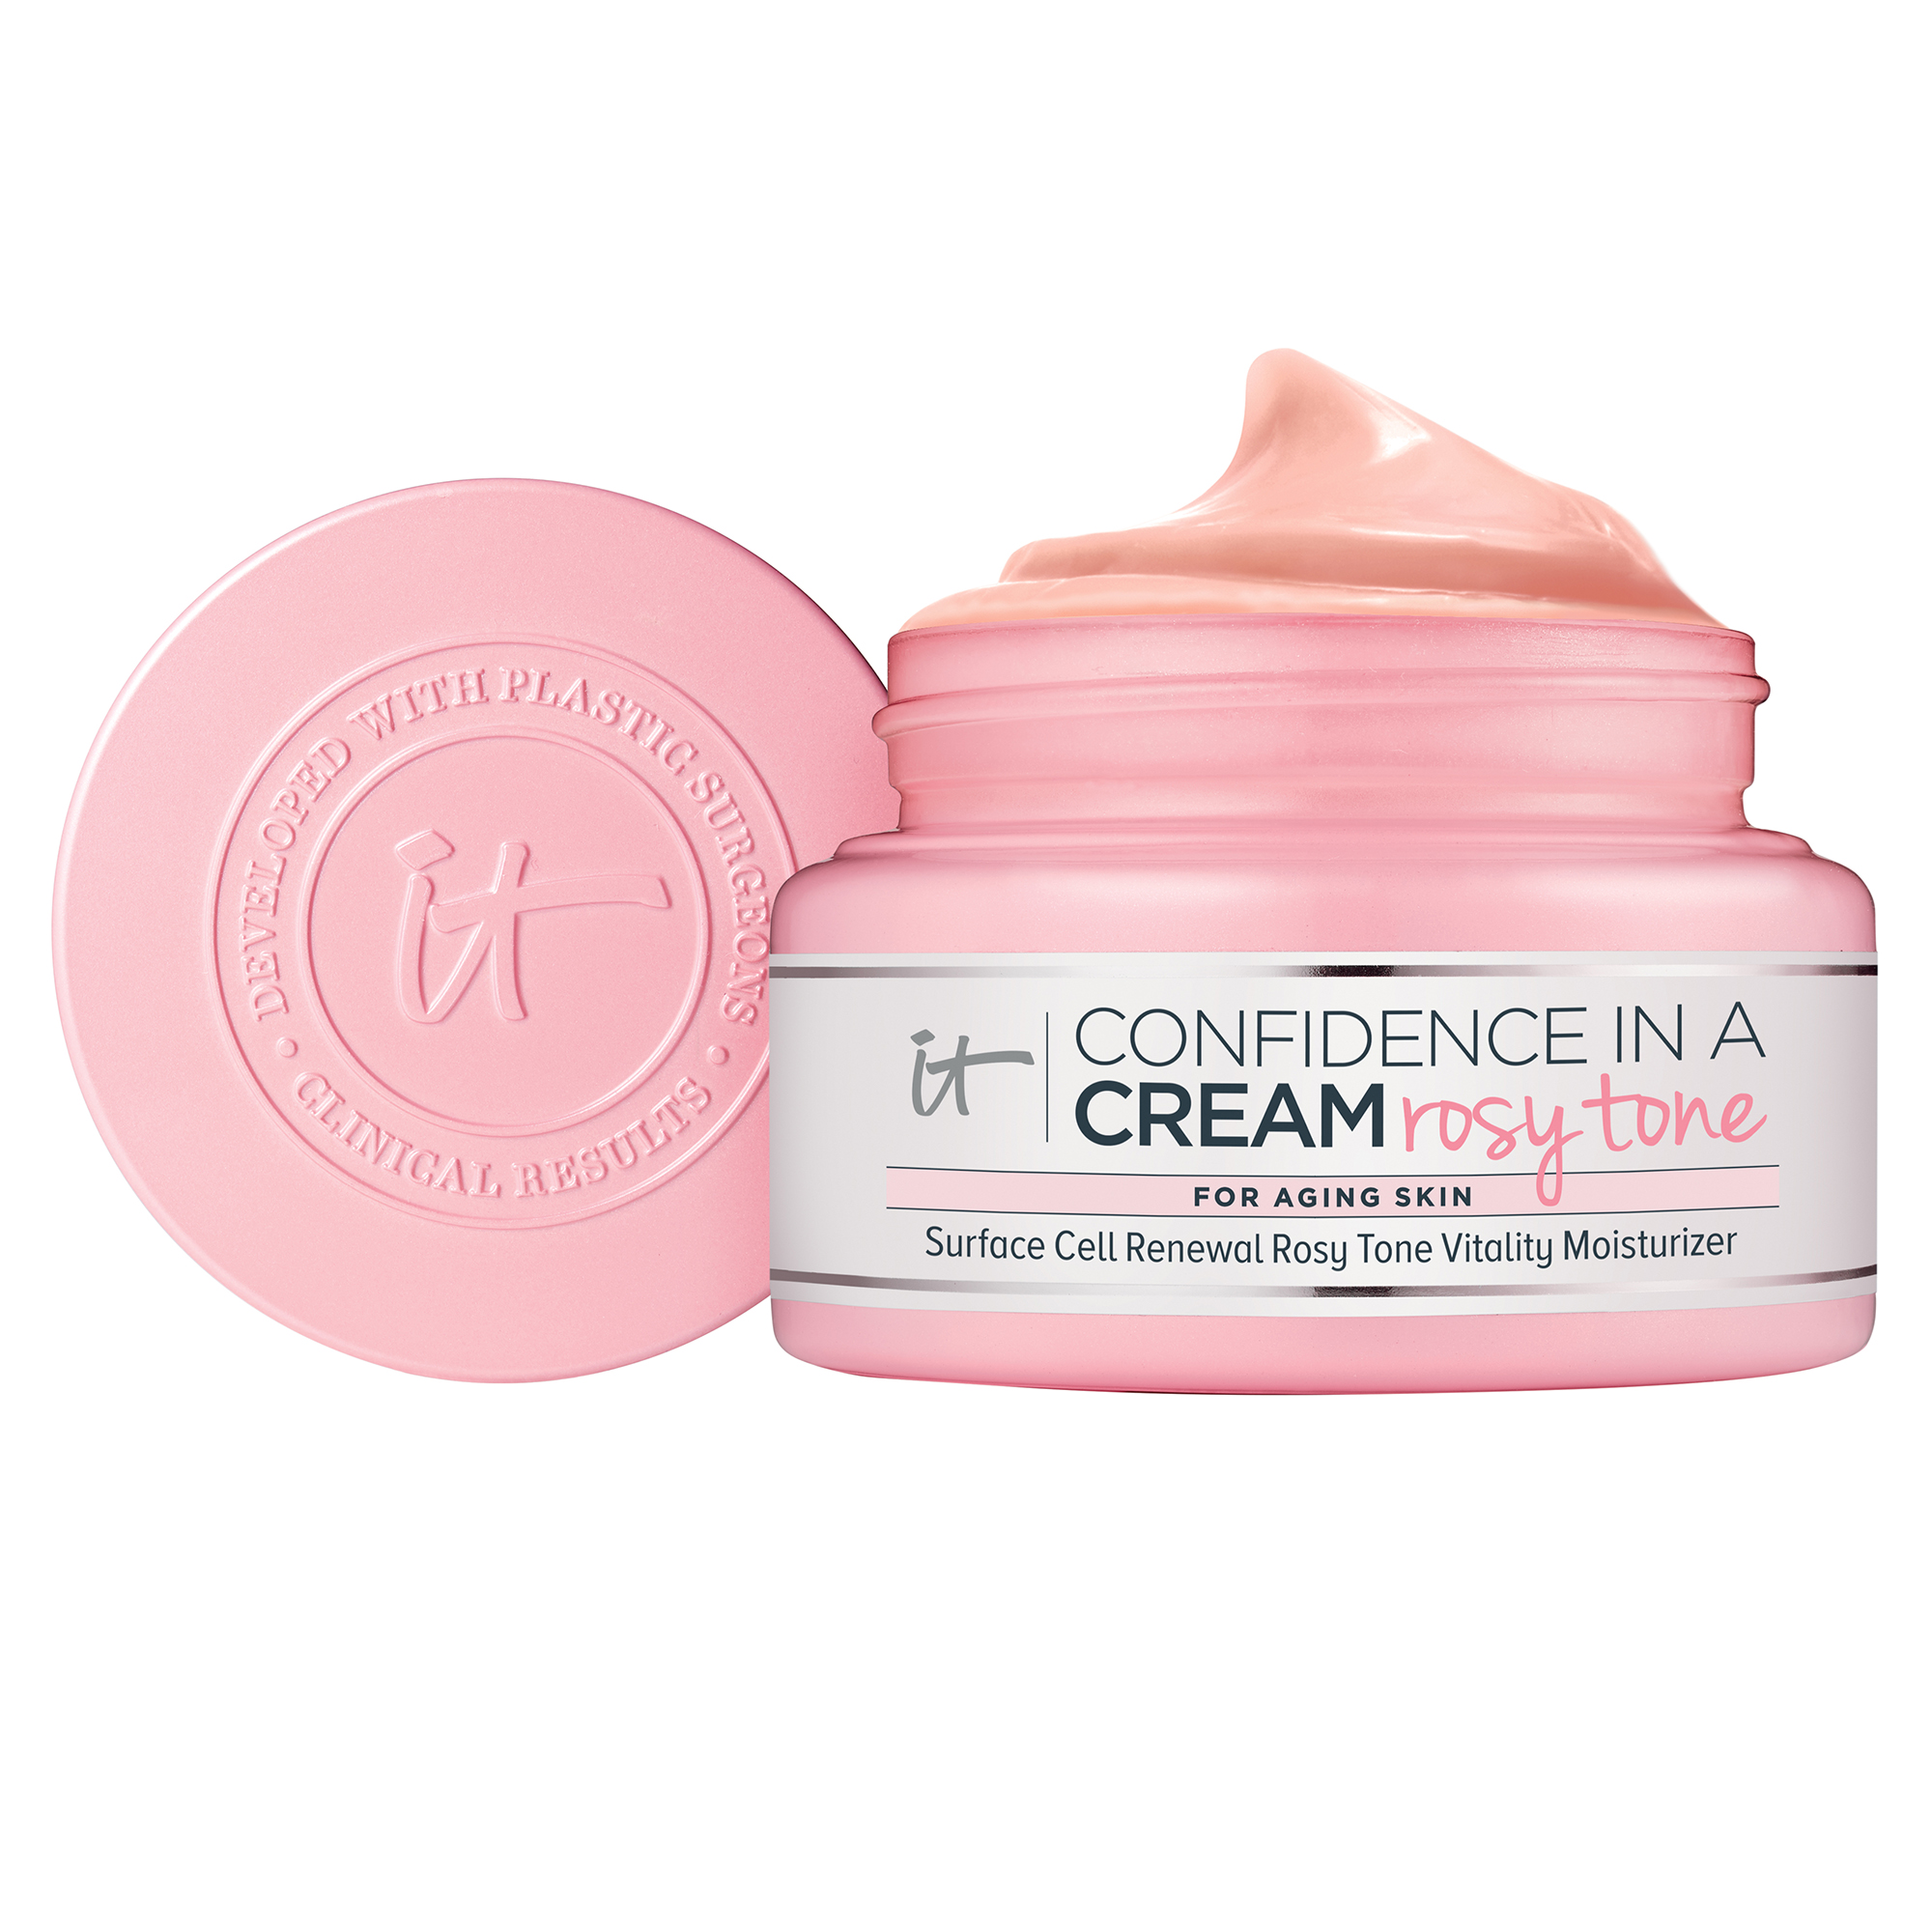 it-cosmetics-confidence-in-a-cream-rosy-tone_cap_left_side.jpg